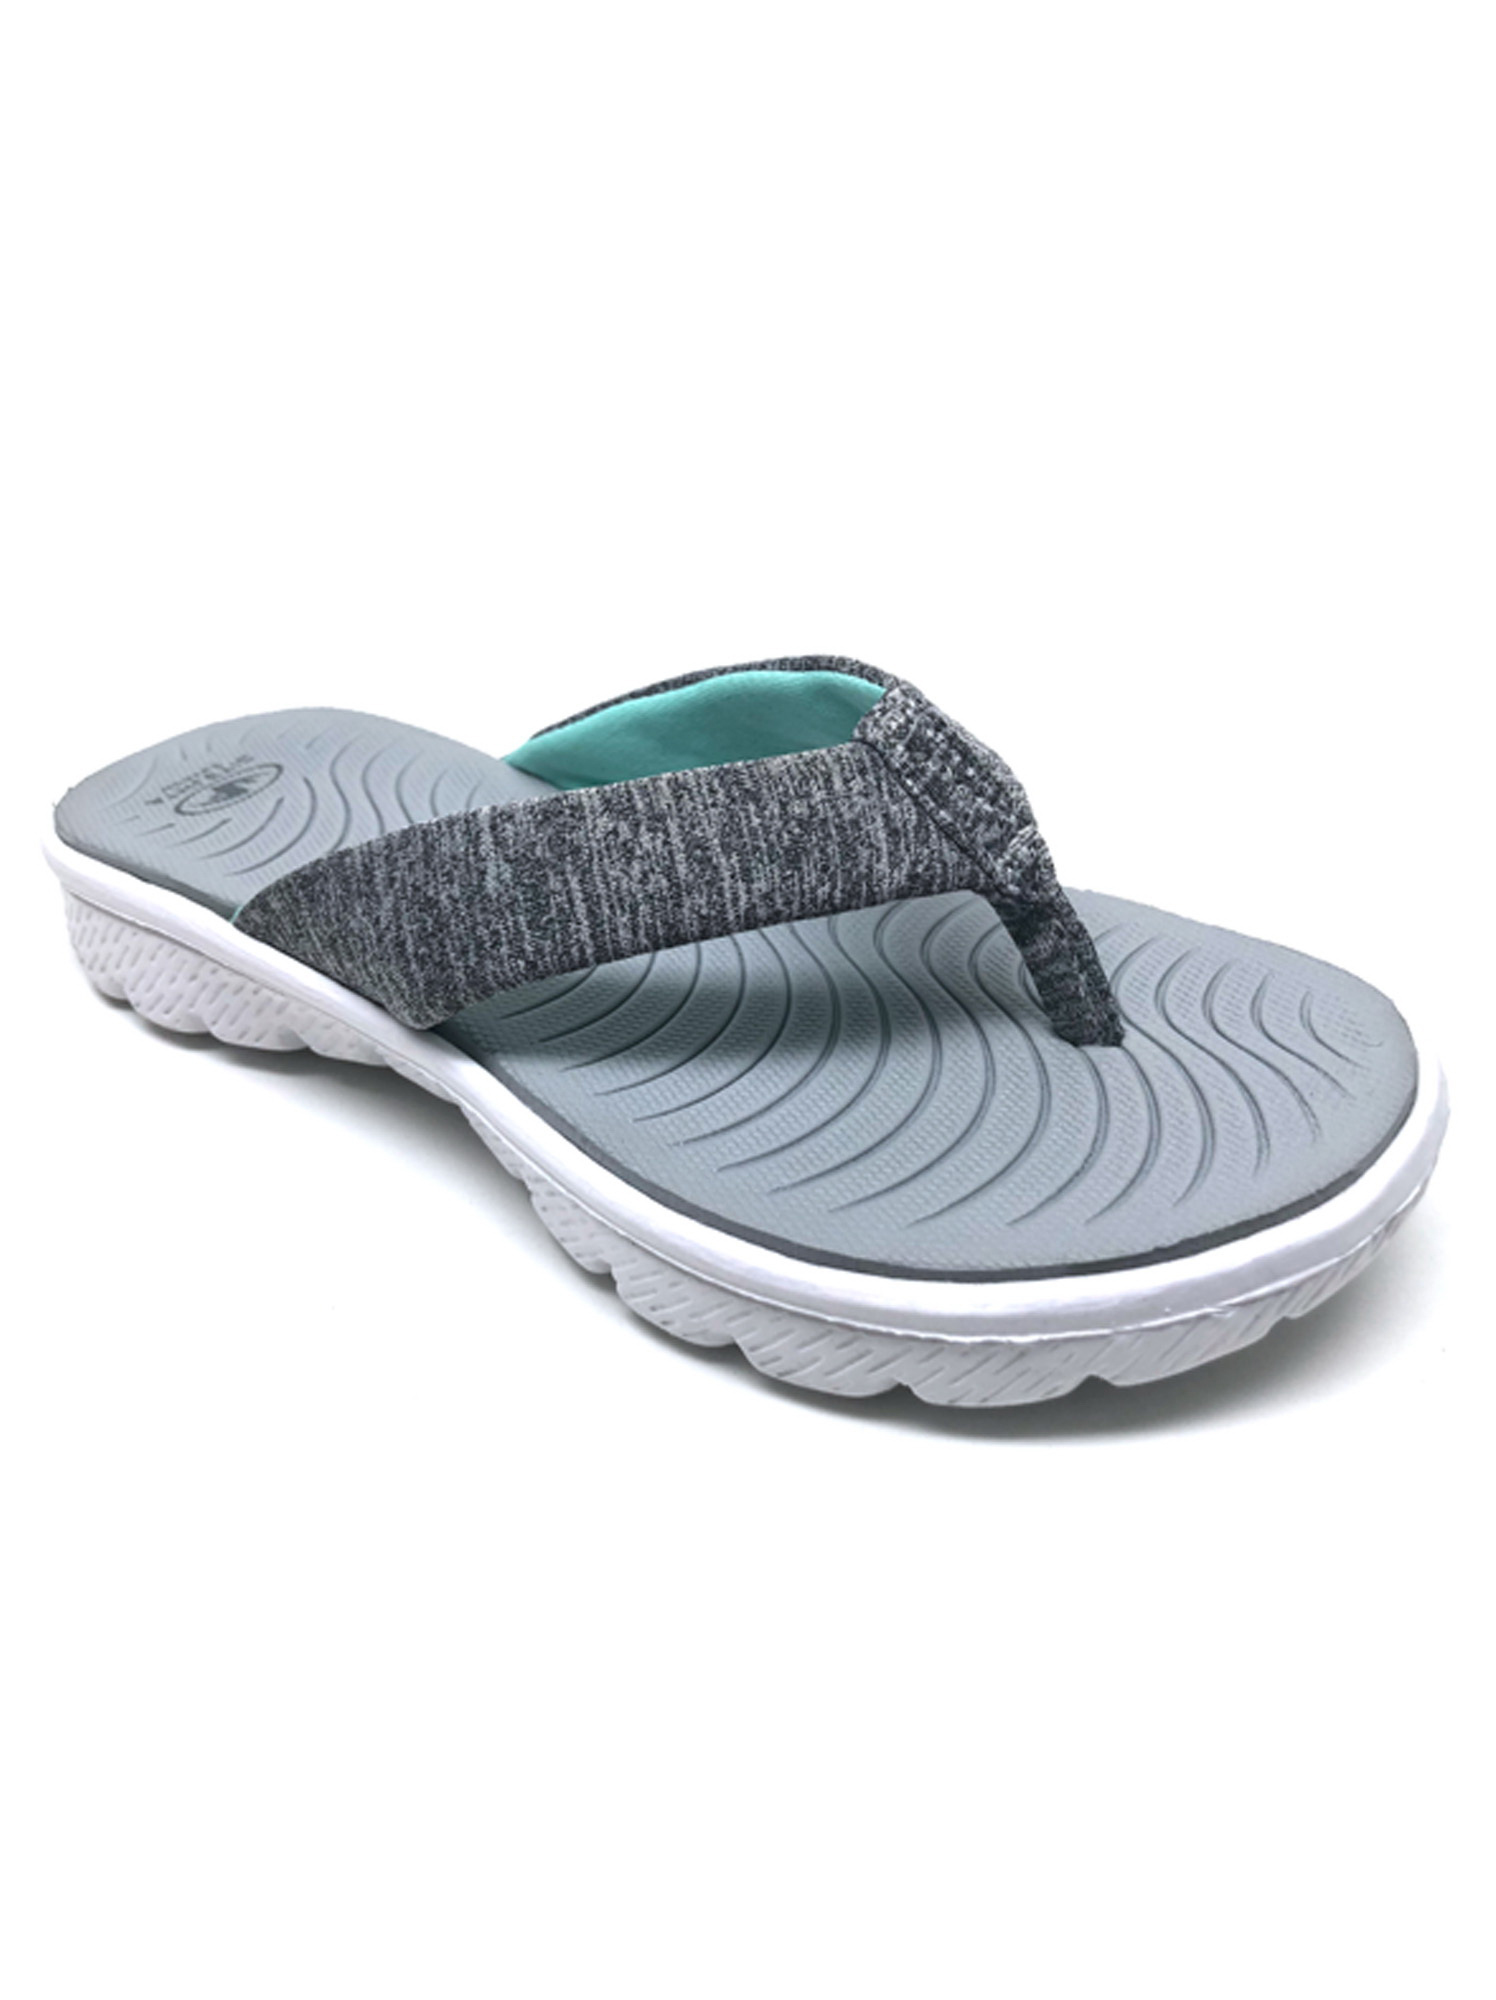 Athletic Works Women's Thong Sandal